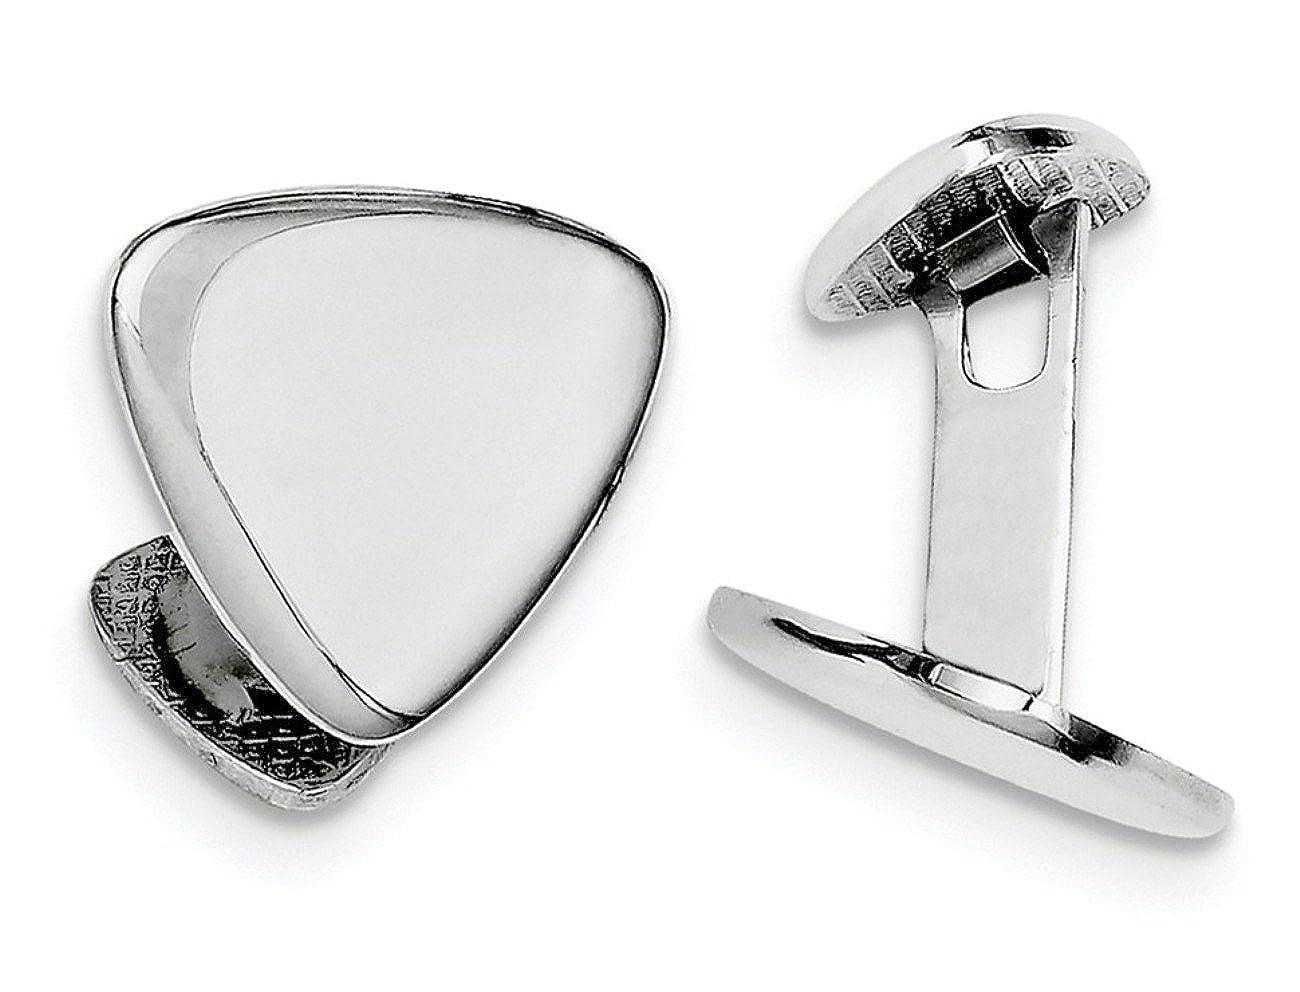 17MM Italian Rhodium-Plated Sterling Silver Triangle Cuff Links